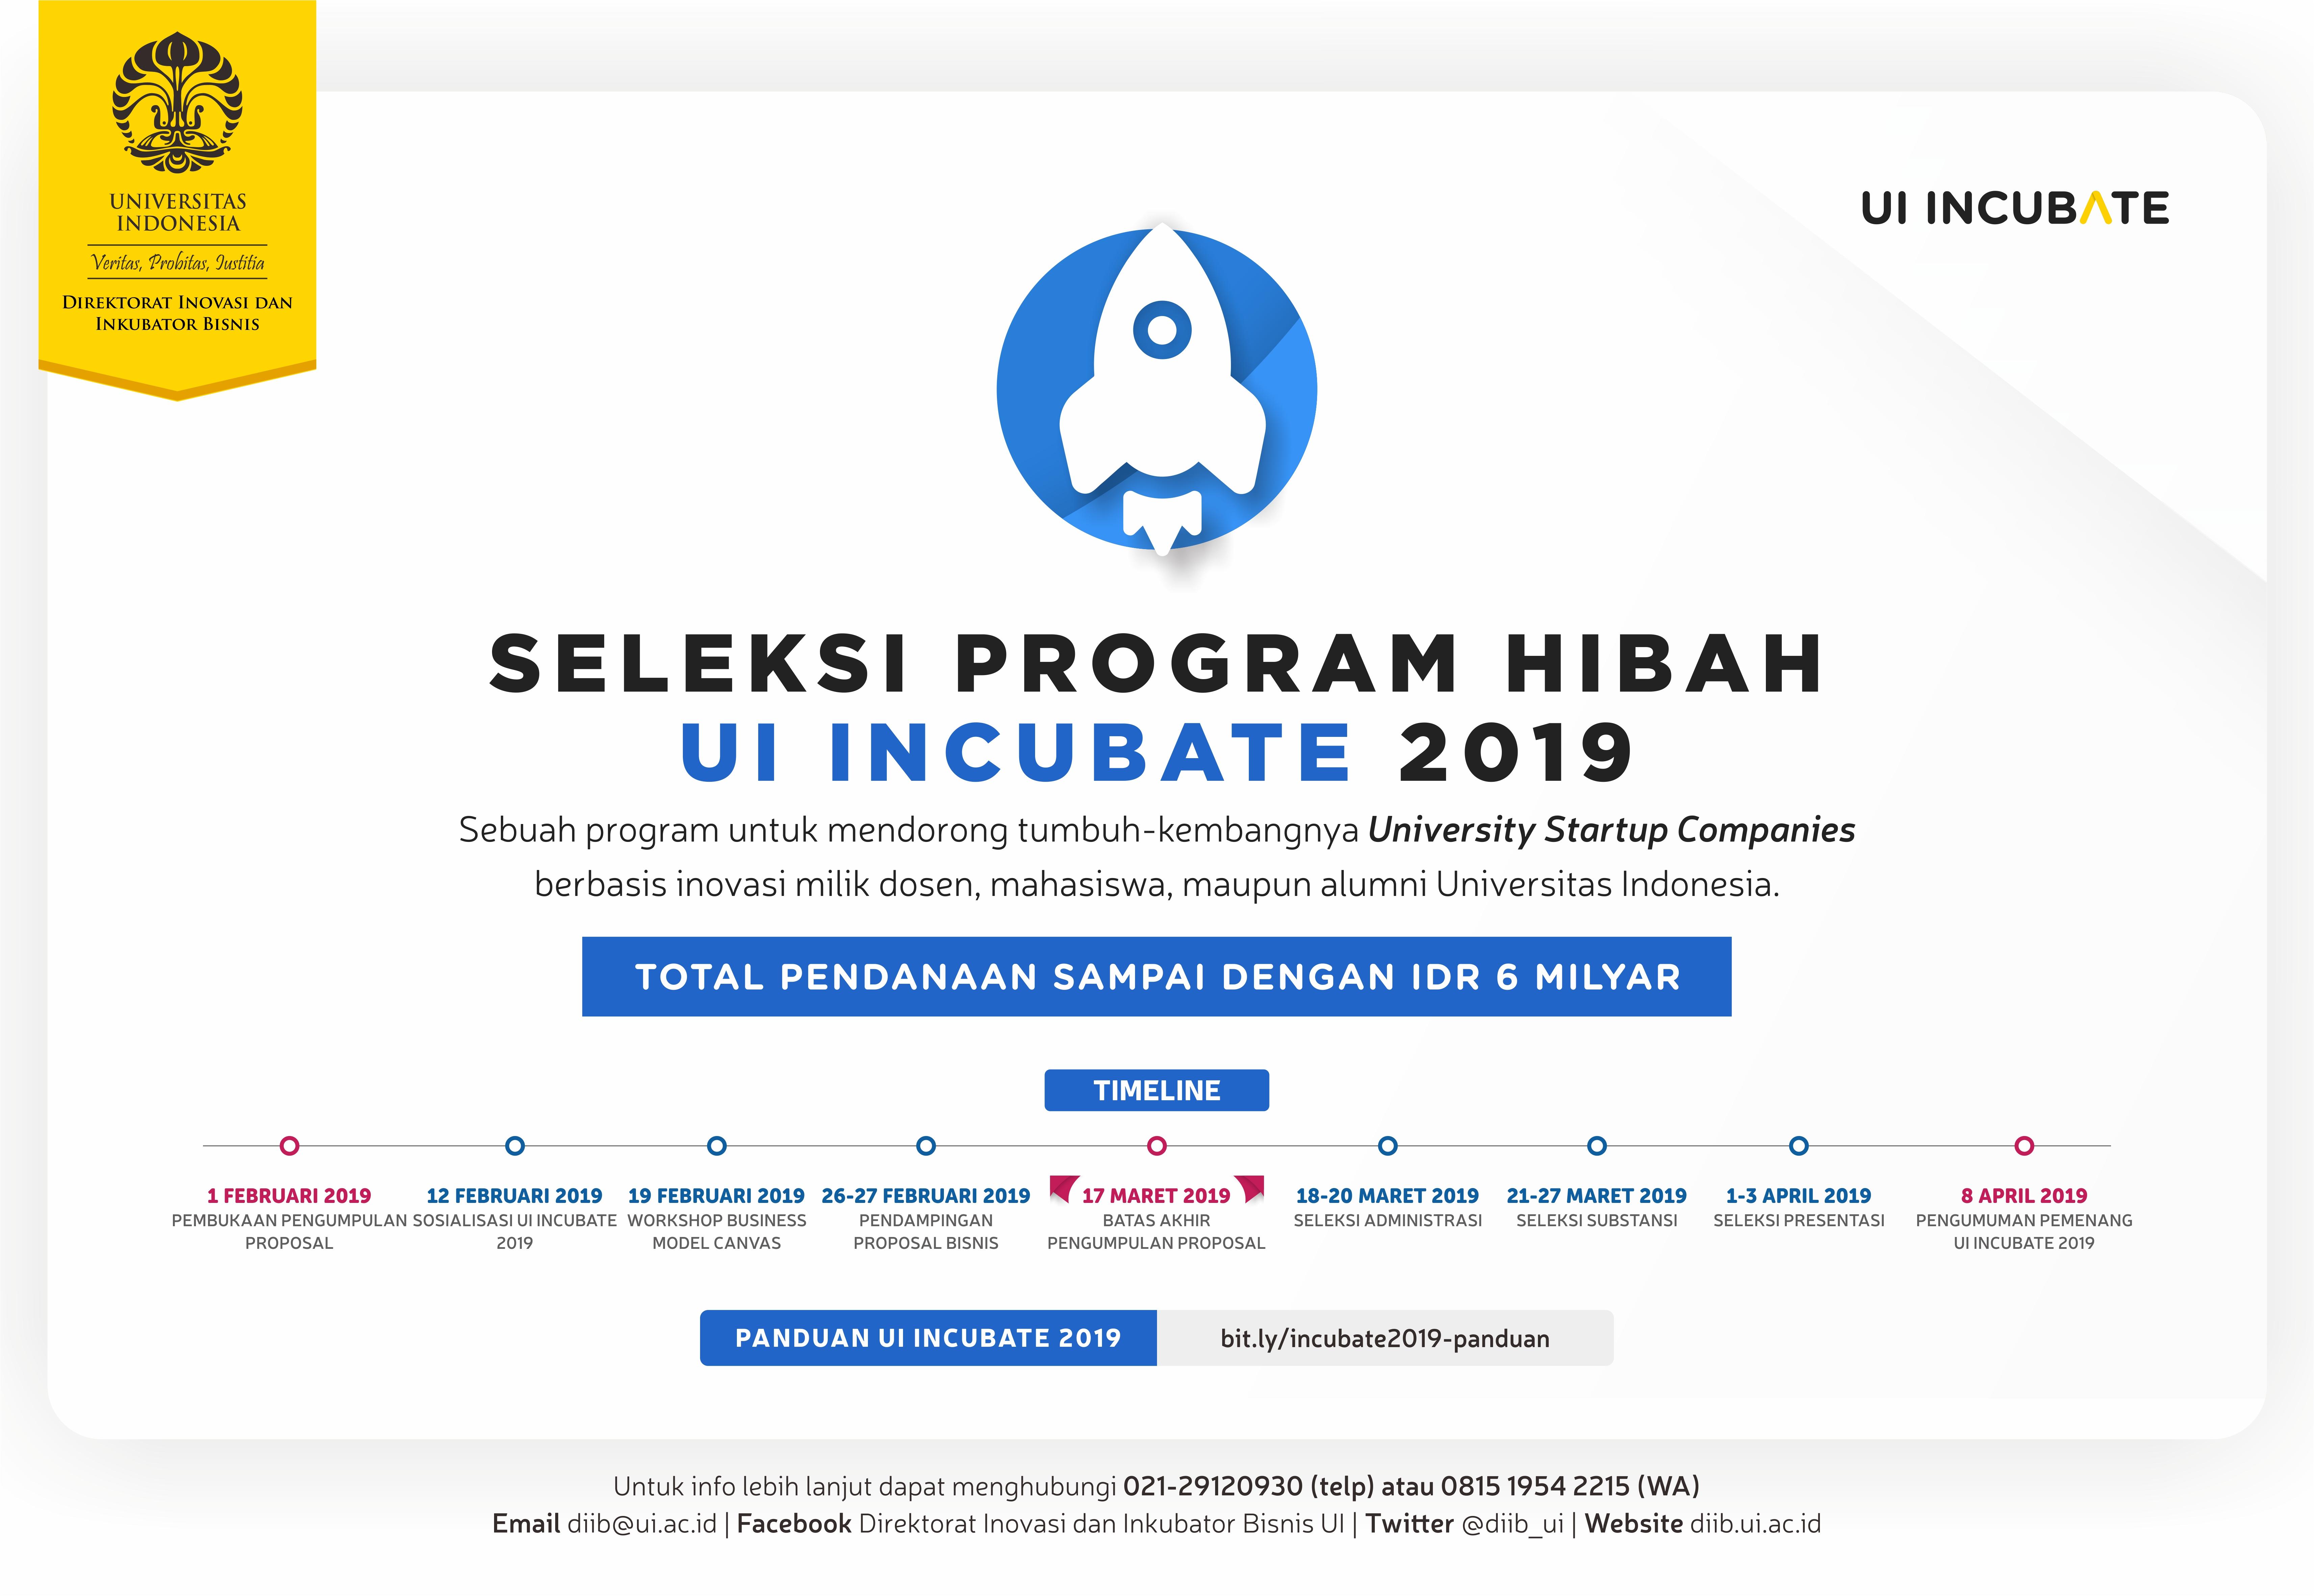 UI Incubate 2019